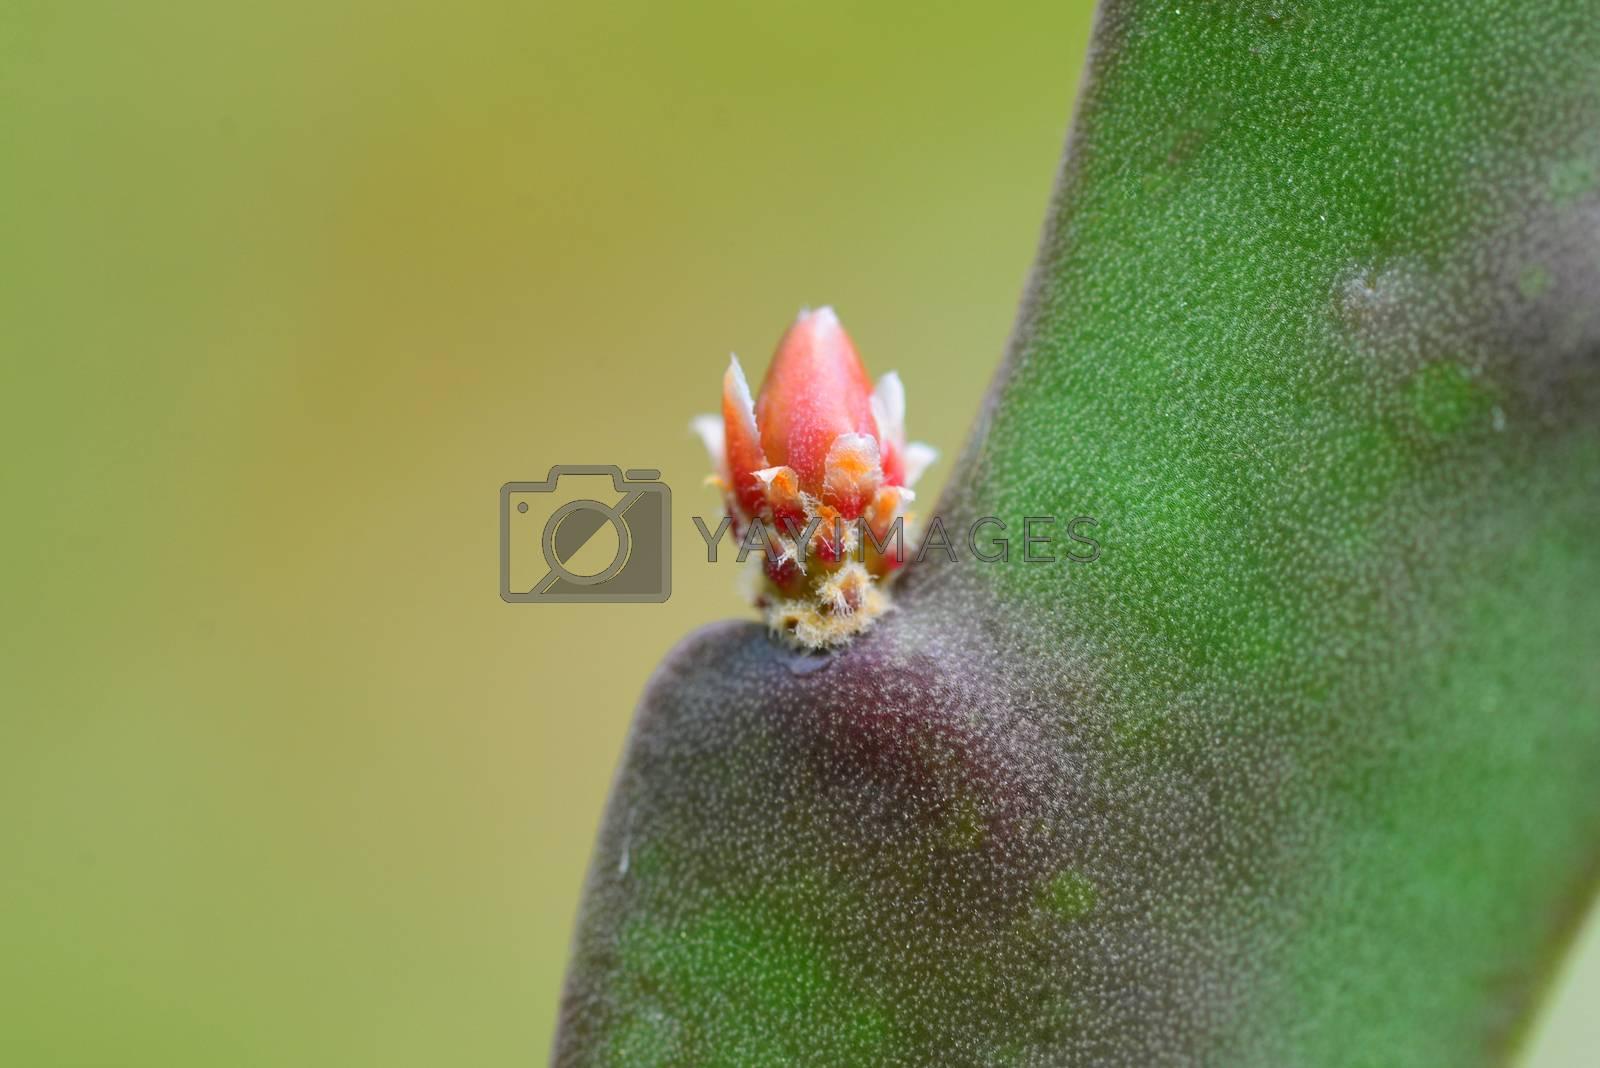 opuntia plant cactus bud close detail outdoors